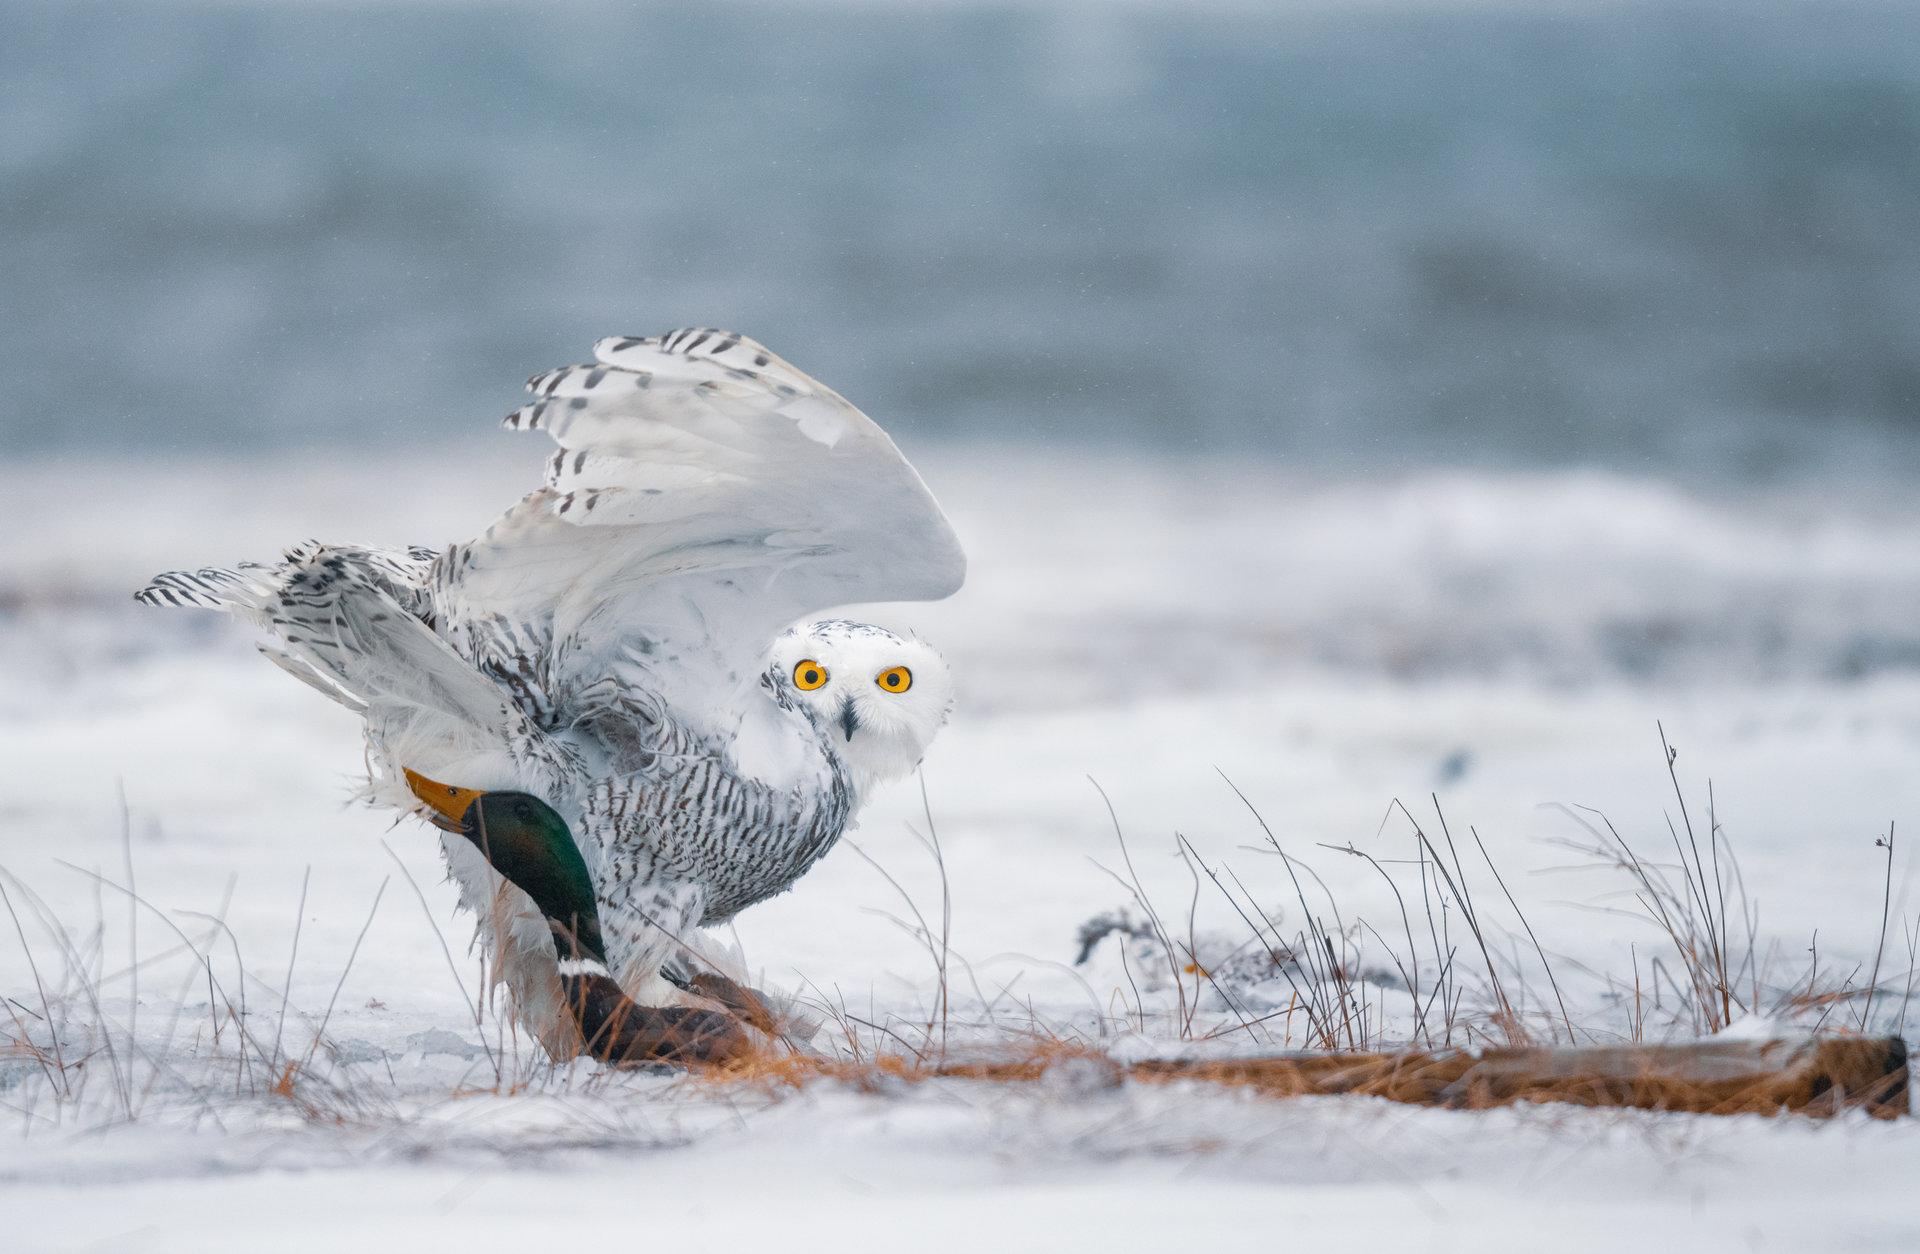 Photo in Wild life   Author Zhoro  - HITTHEROAD   PHOTO FORUM